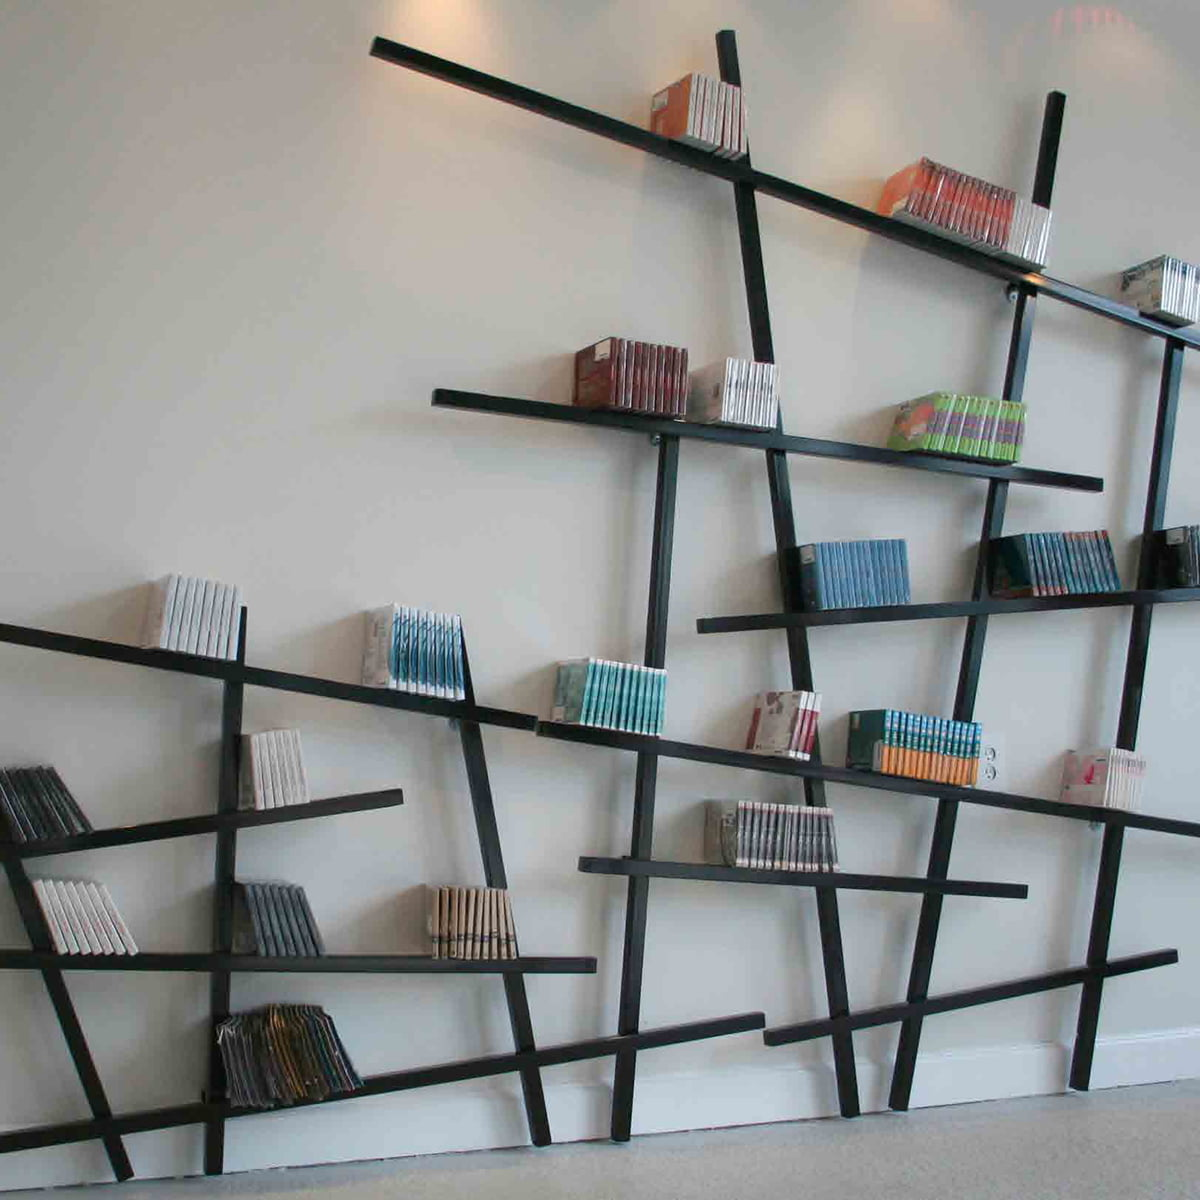 edition compagnie mikado bookshelf - Funky Bookshelves